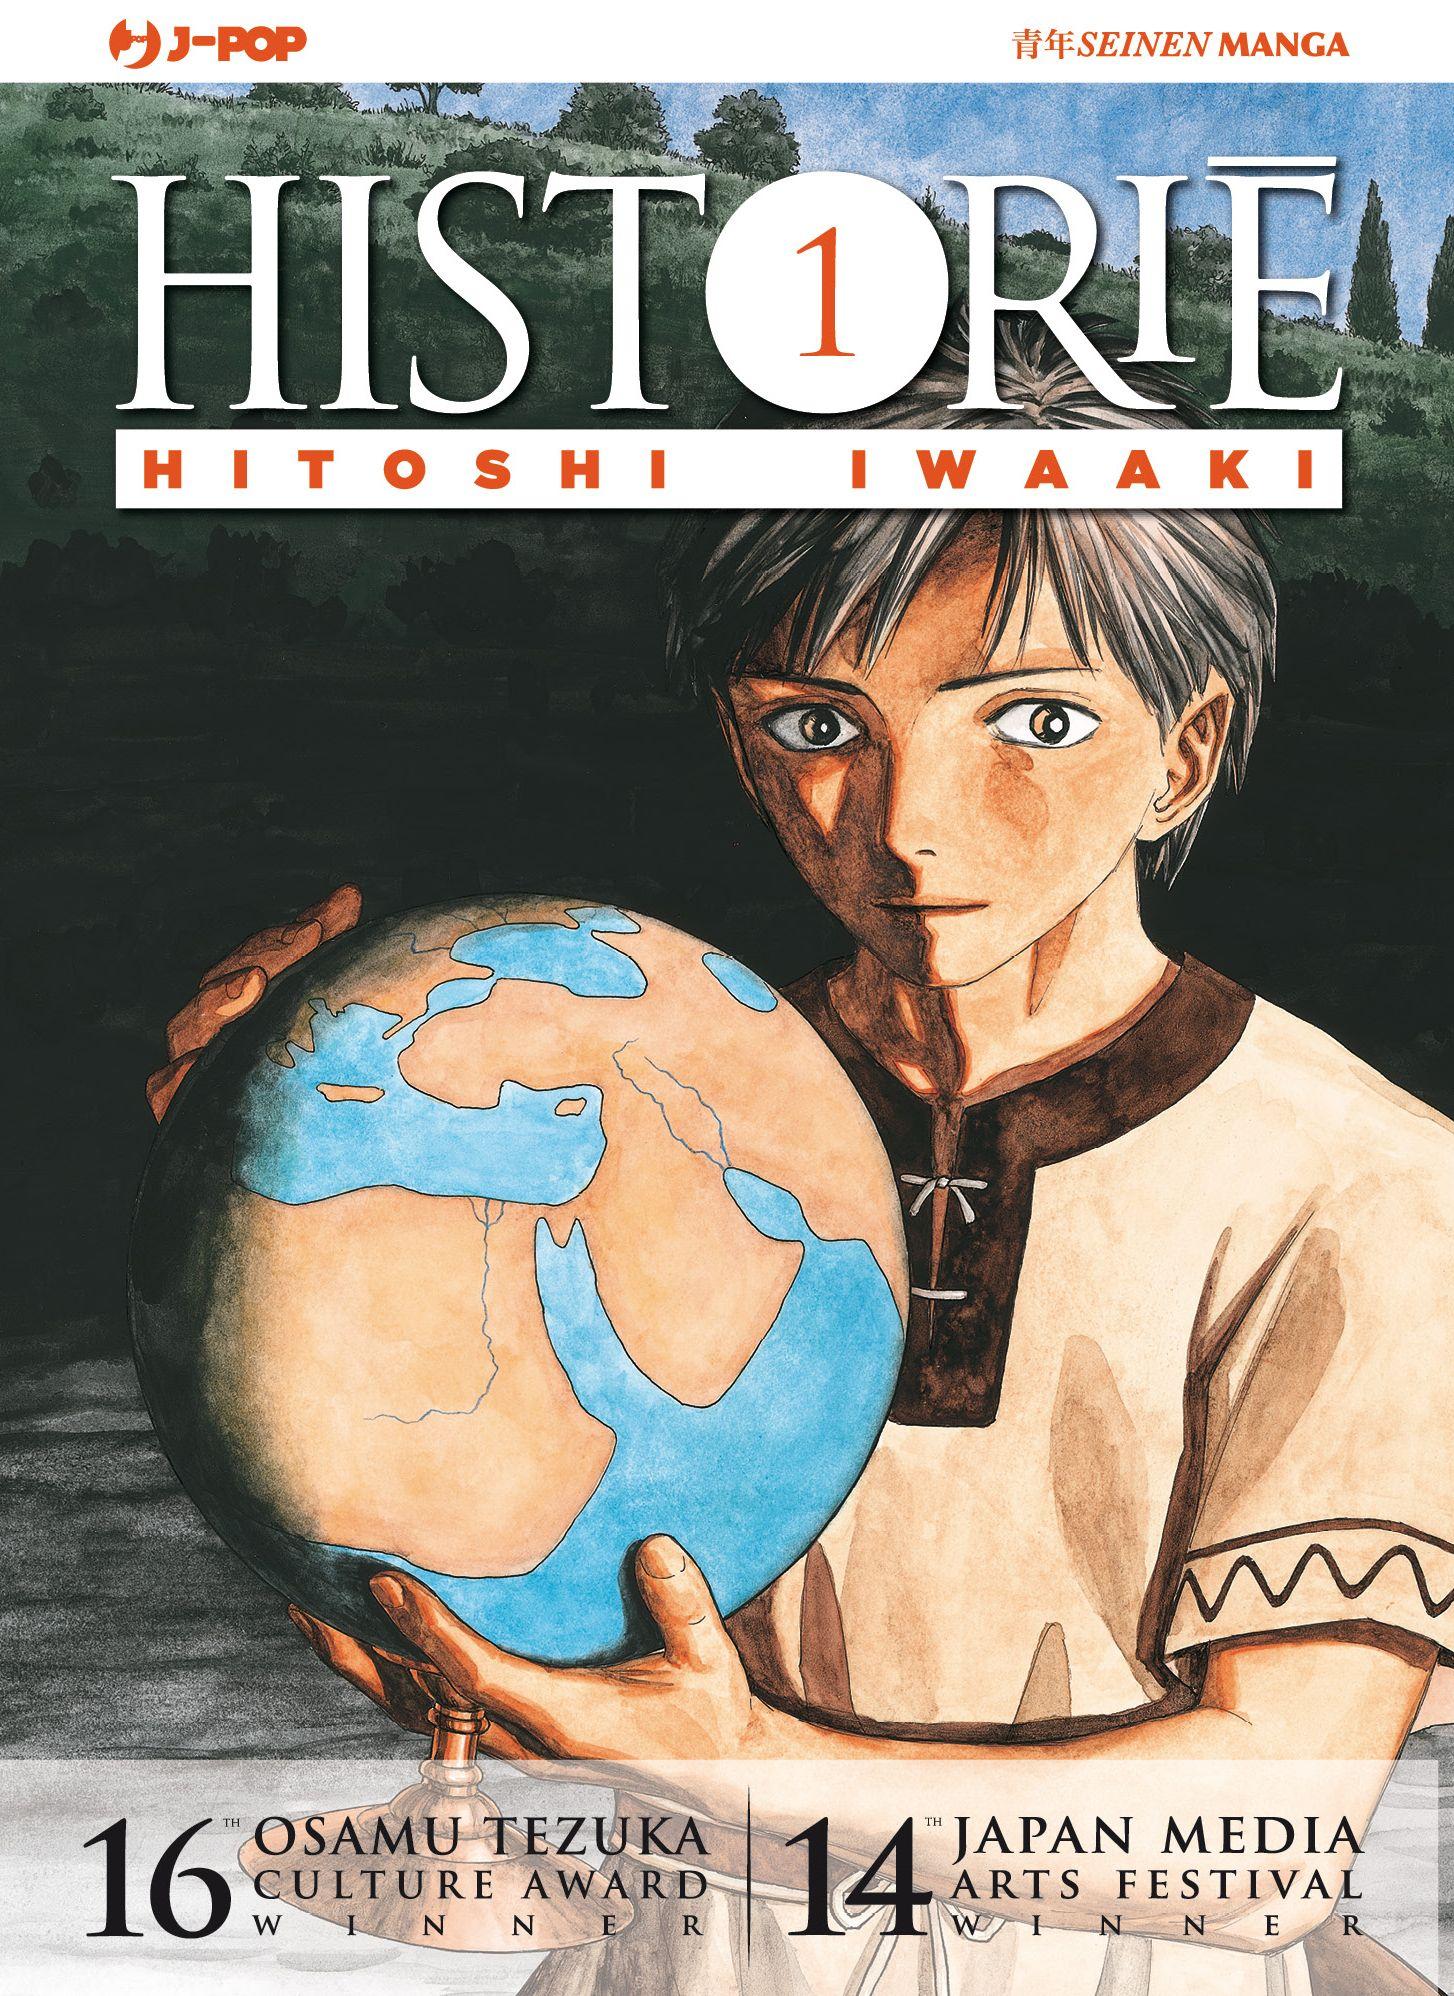 Historie 1 J-pop